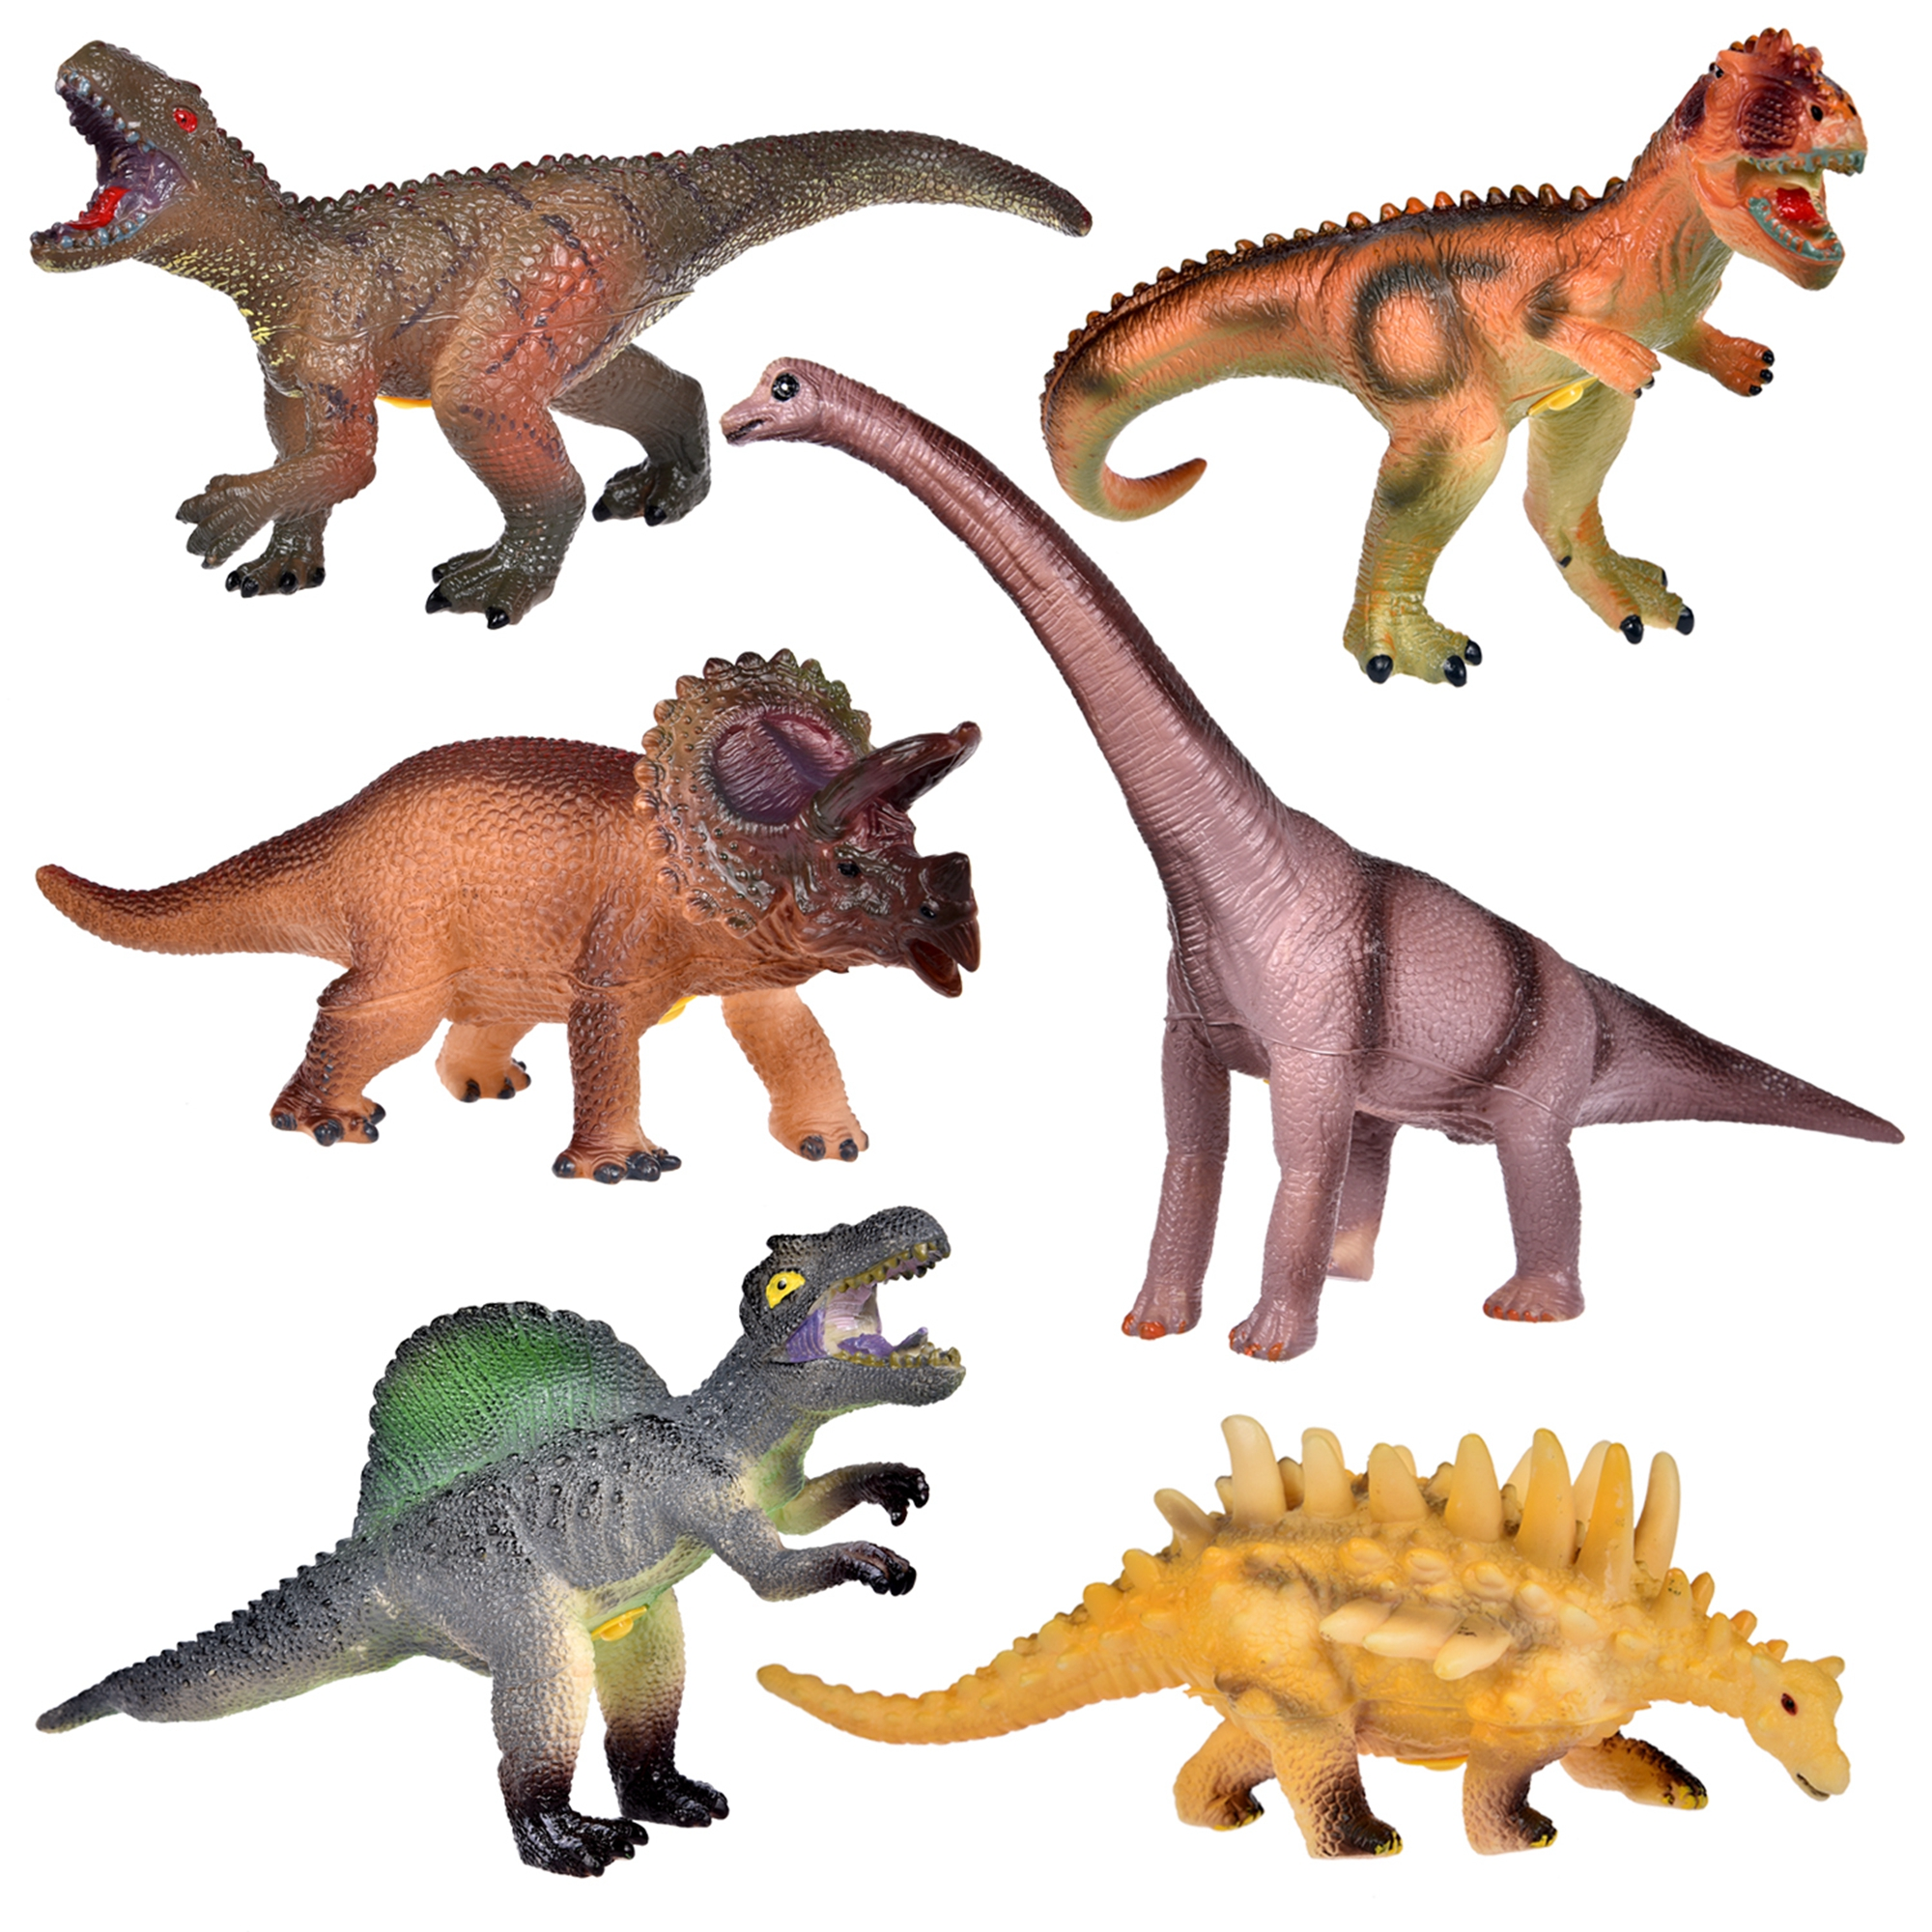 Dinosaur Dinosaurs Tyrannosaurus T Rex Spinosaurus ... |Triceratops Dinosaur